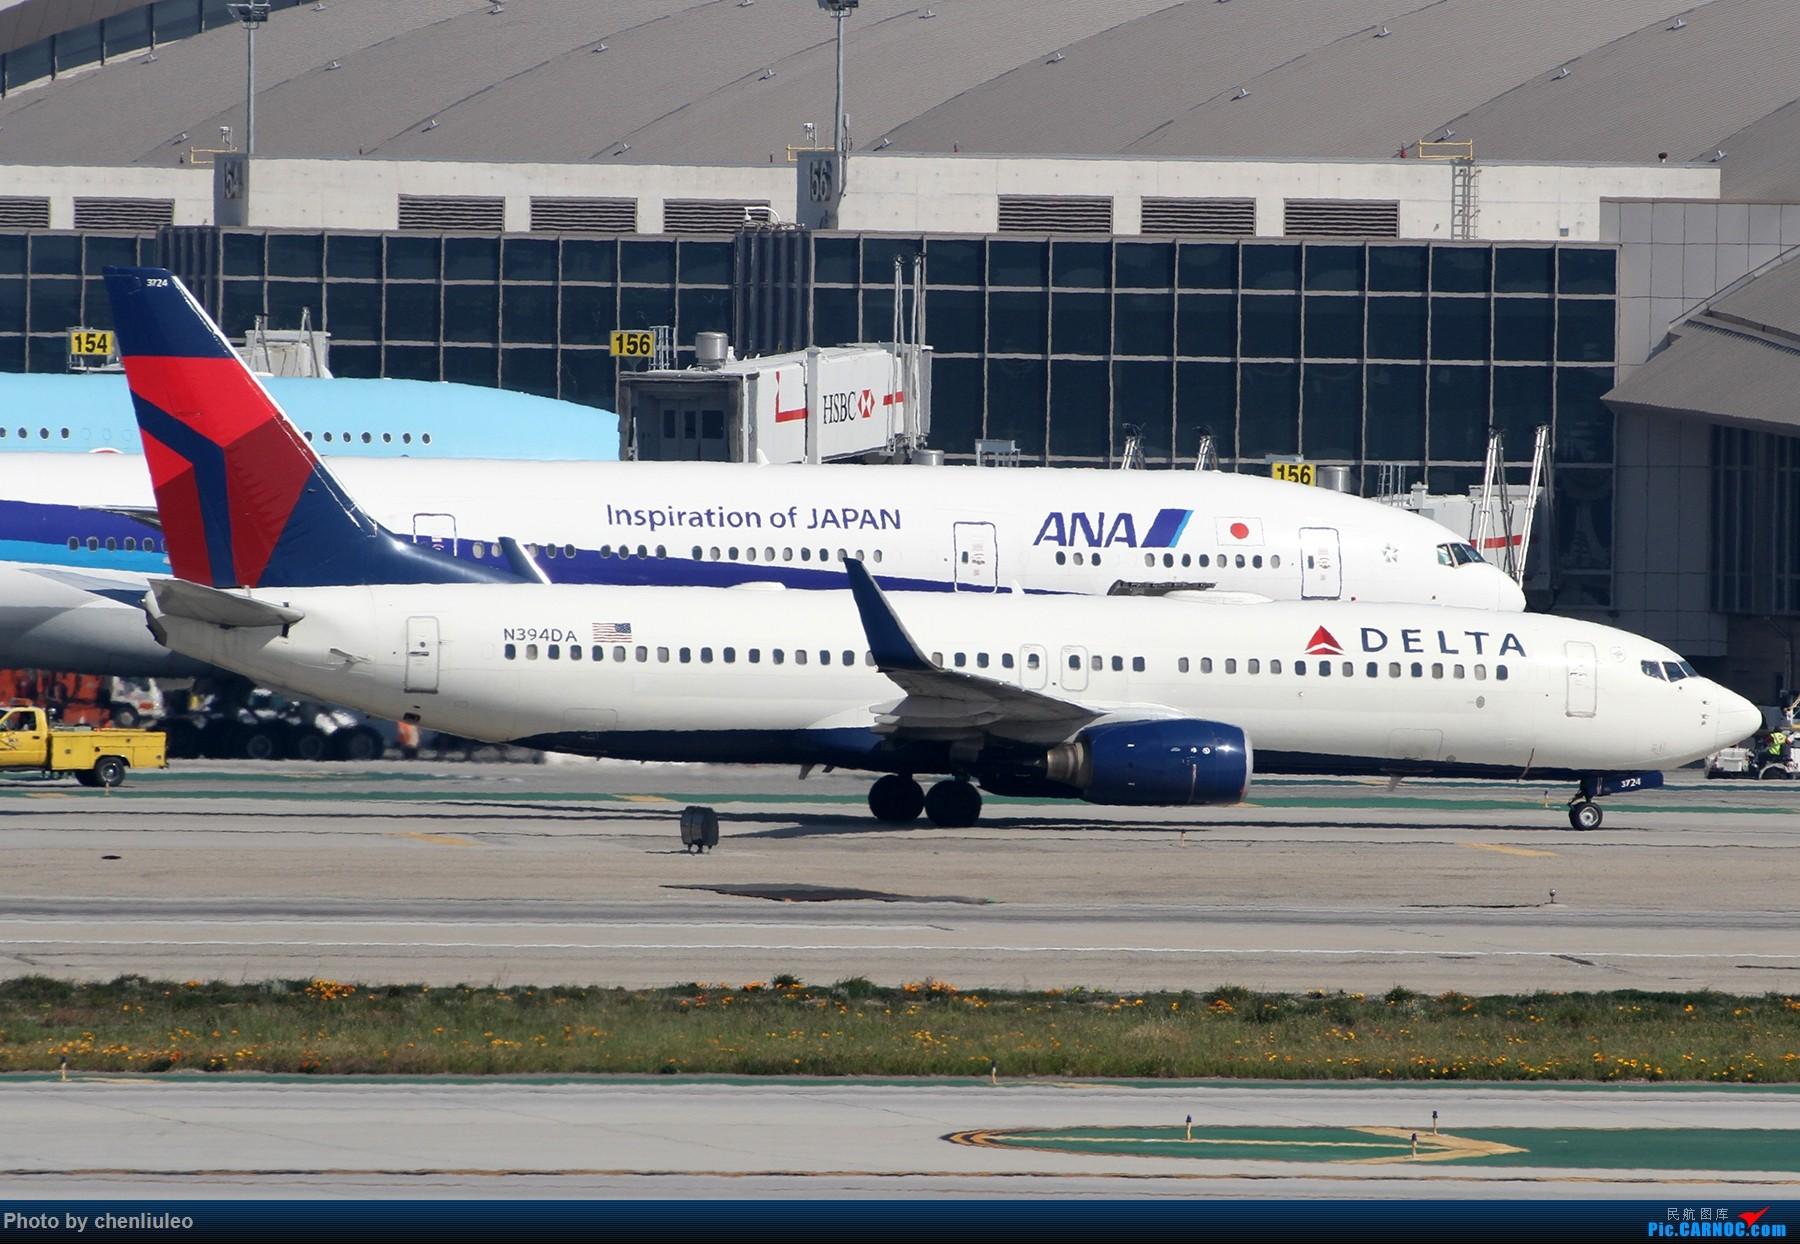 Re:[原创]【北美飞友会】全日空星球大战BB-8黄昏中降落LAX 以及一些杂图 BOEING 737-800 N394DA 美国洛杉矶机场